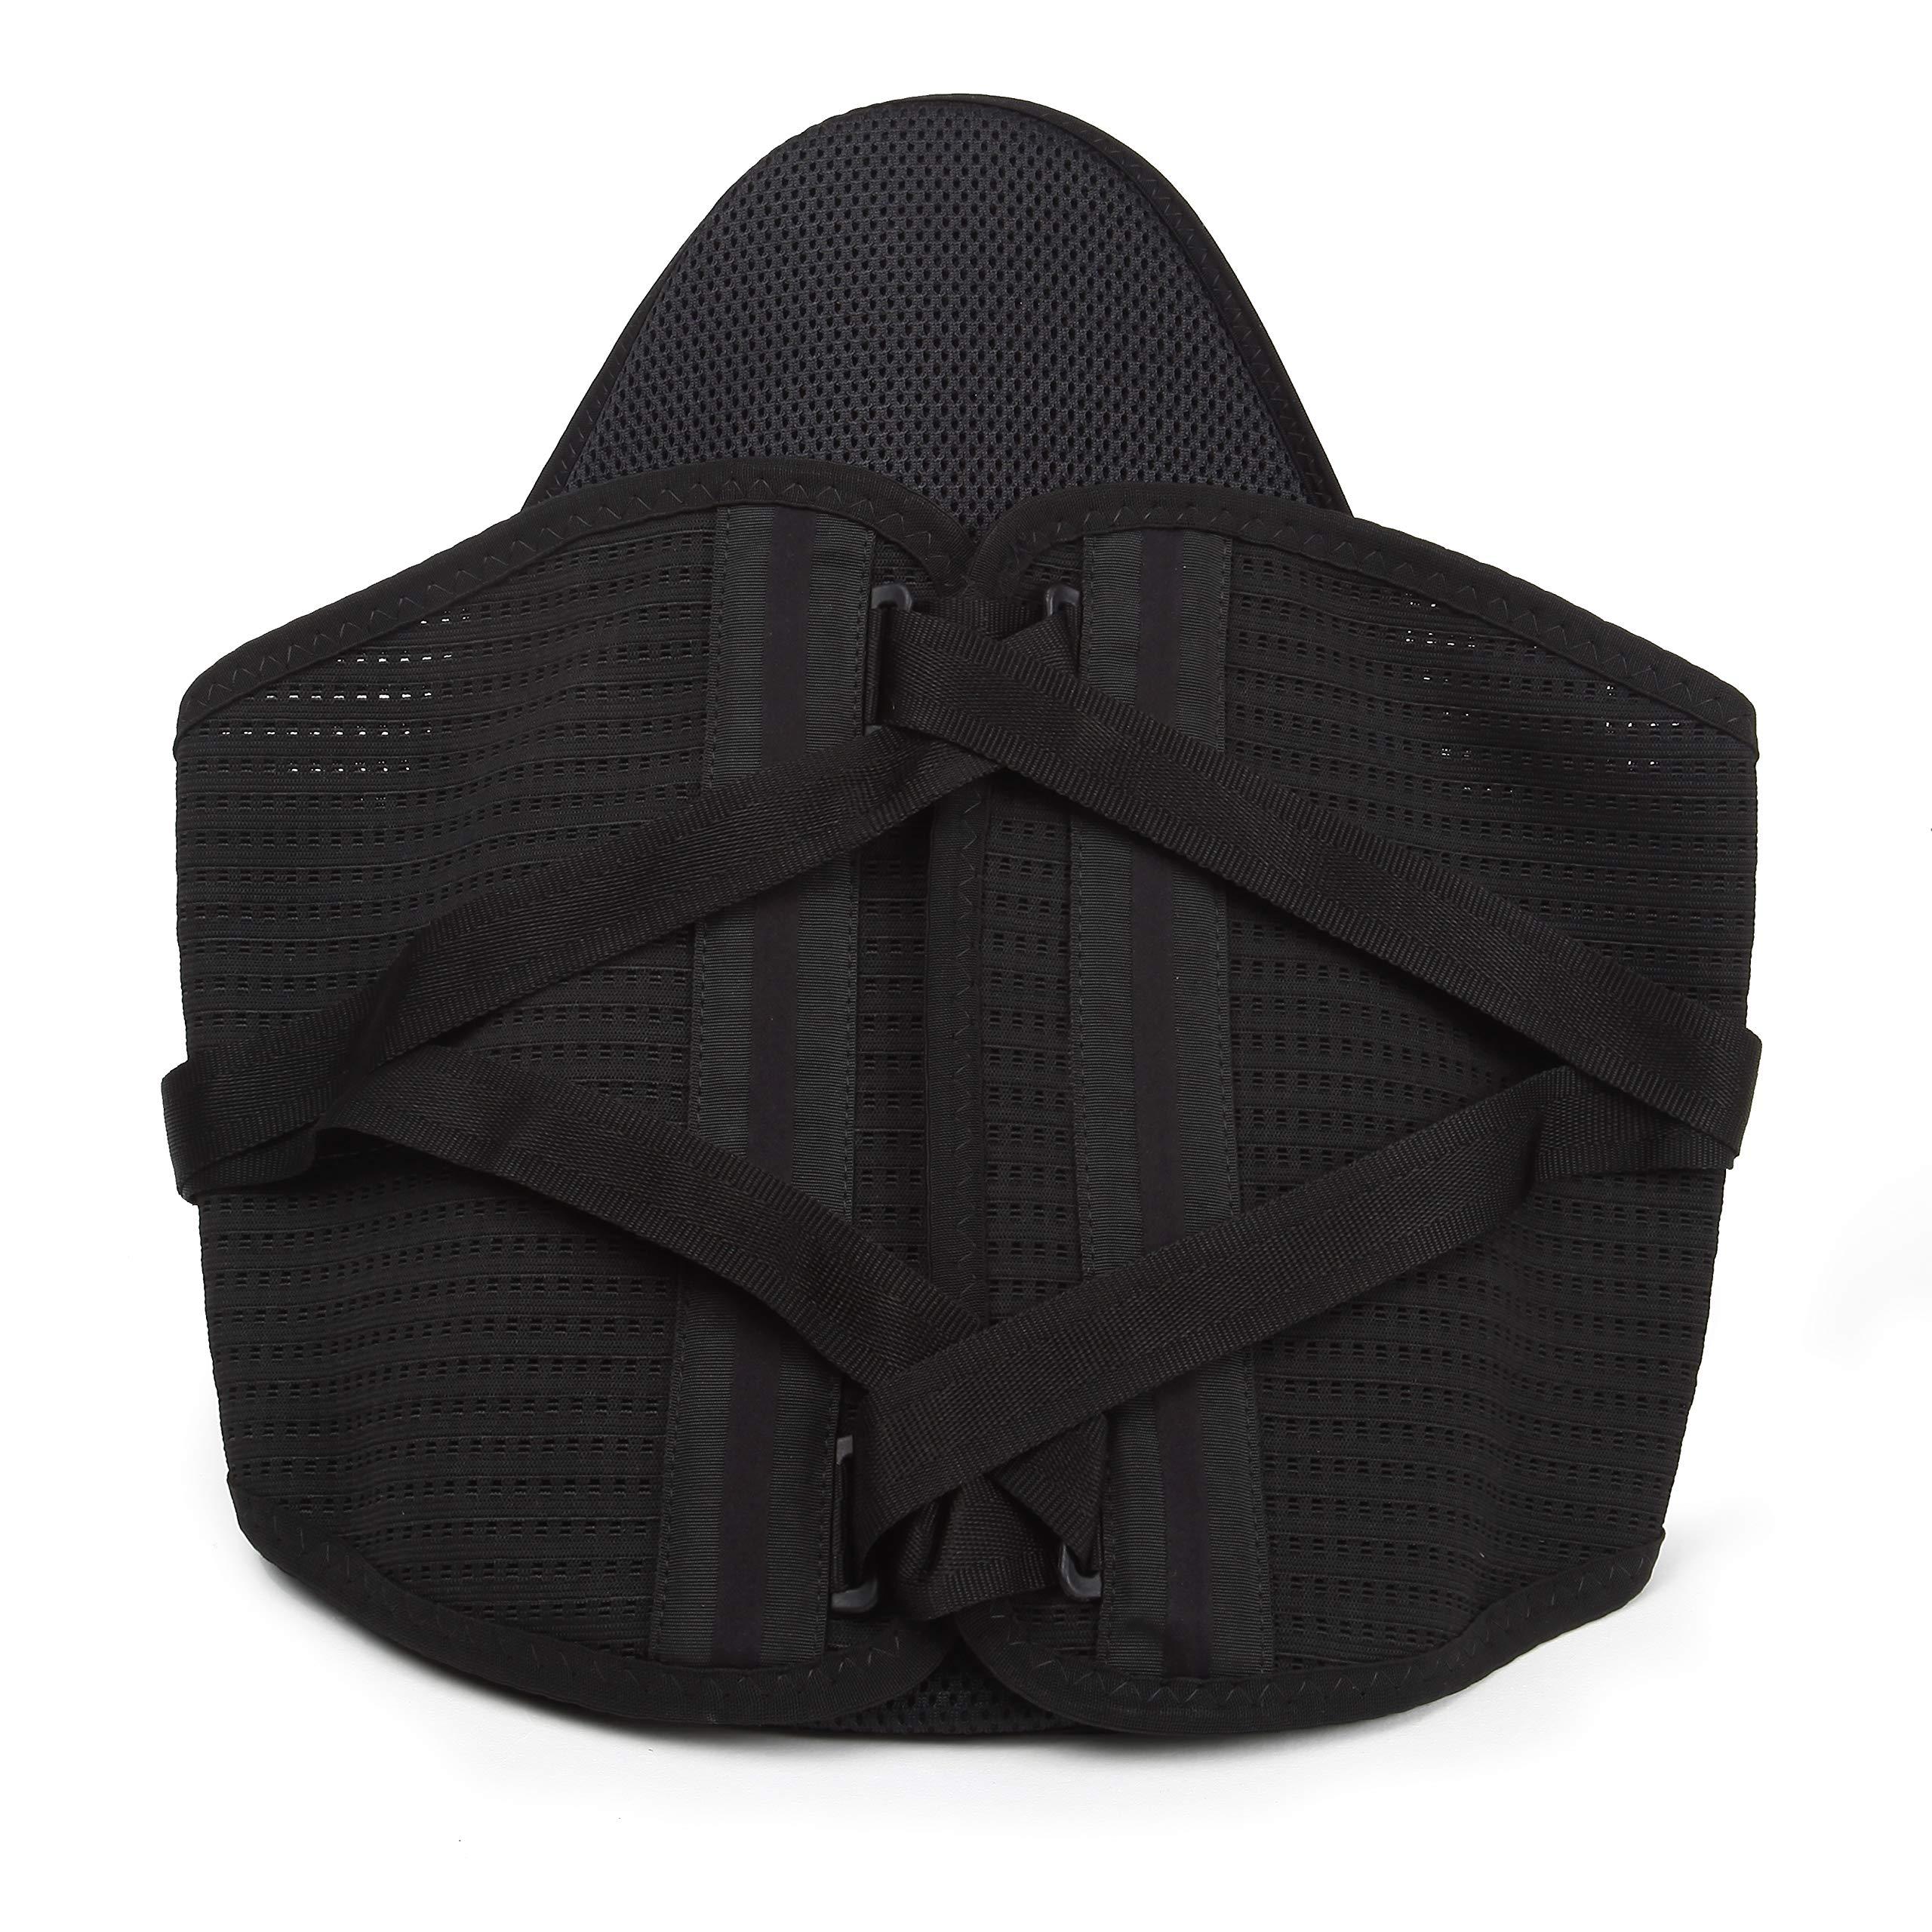 Ossur Back Brace for Lower Back Pain, Lumbar Support Belt - LSO Back Support- Small